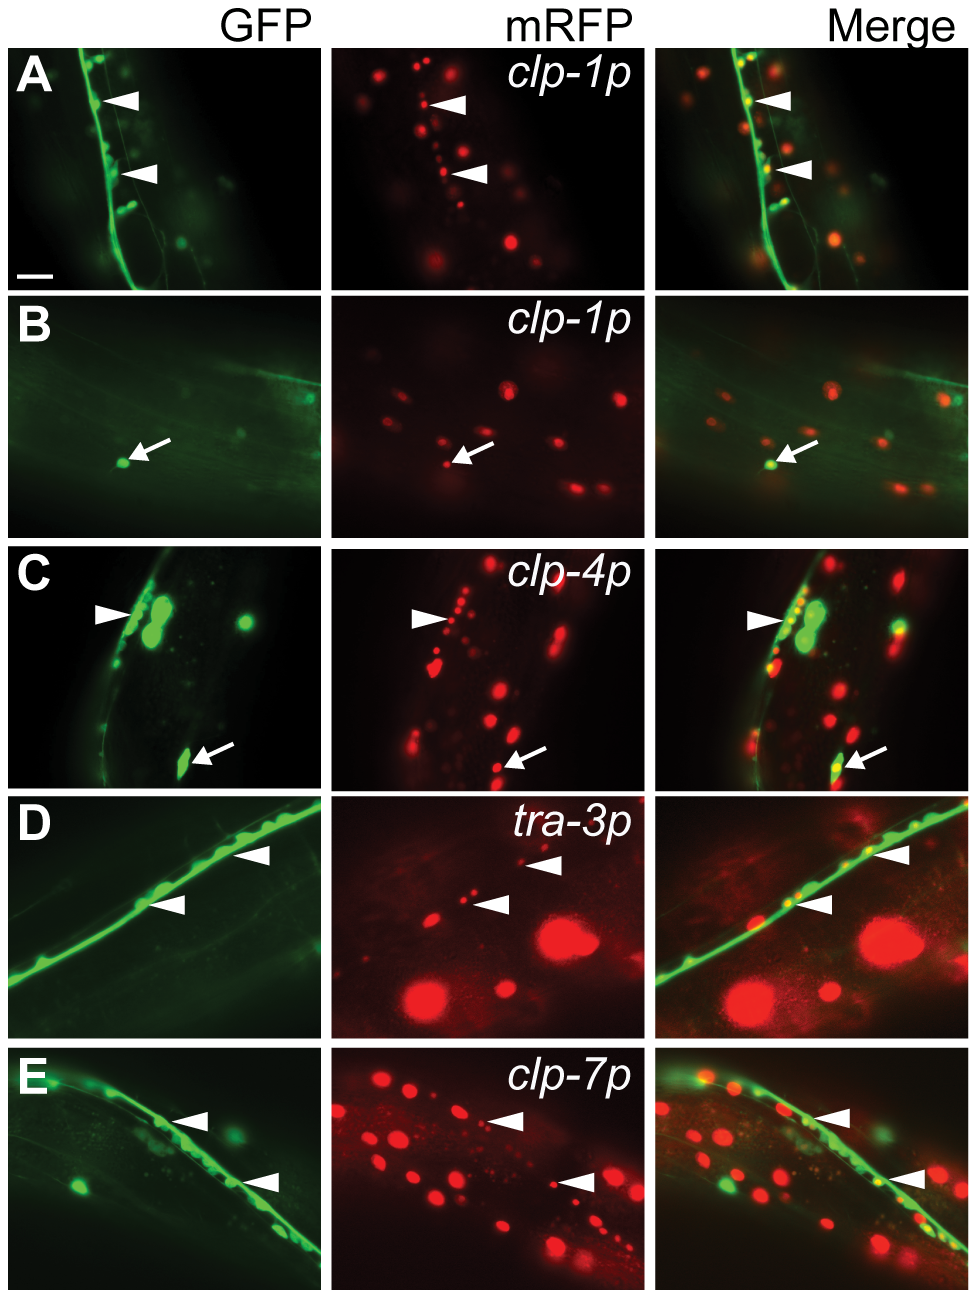 Co-localization of the pan-neuronal <i>unc-119::gfp</i> reporter with calpain <i>nls</i>-<i>mrfp</i> transcriptional reporters.